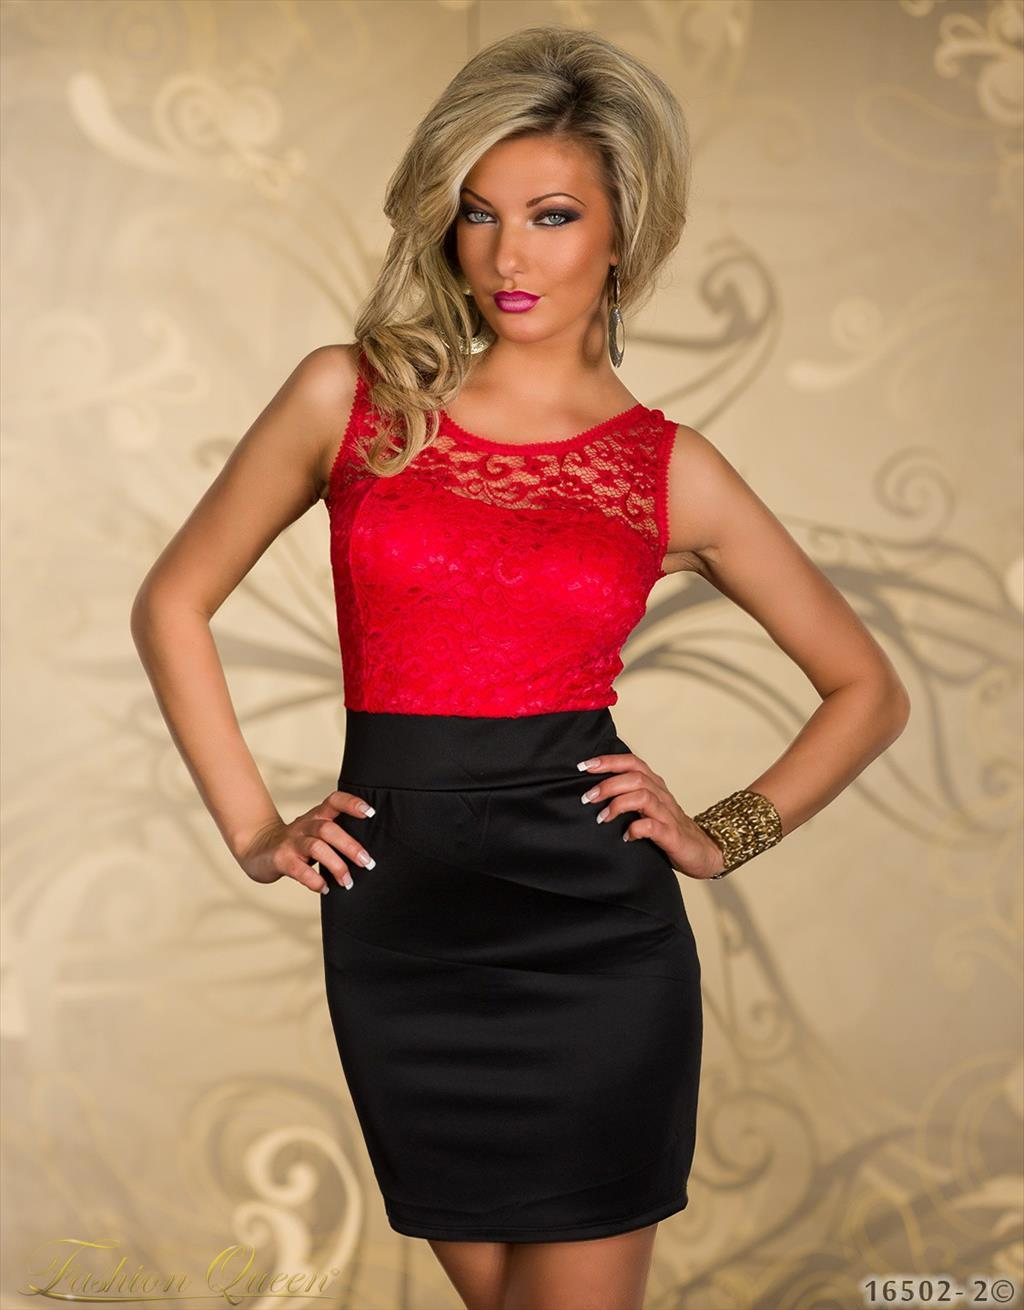 b3362318be91 Fashion Queen - Dámske oblečenie a móda - Elegantné minišaty